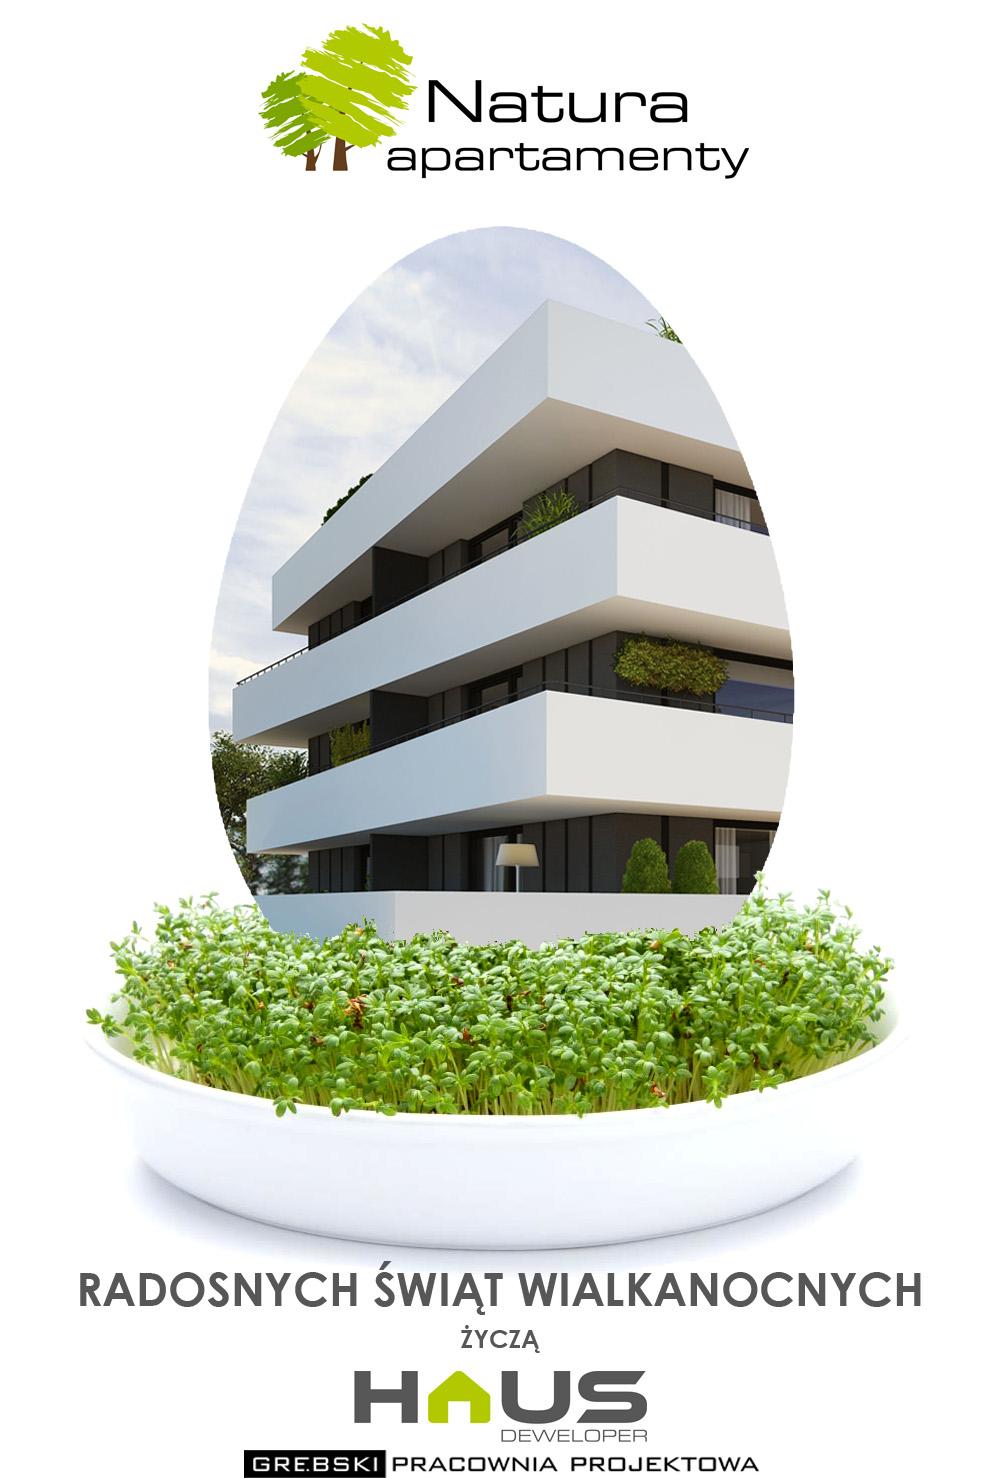 Apartamenty Natura - Kartka Wielkanocna